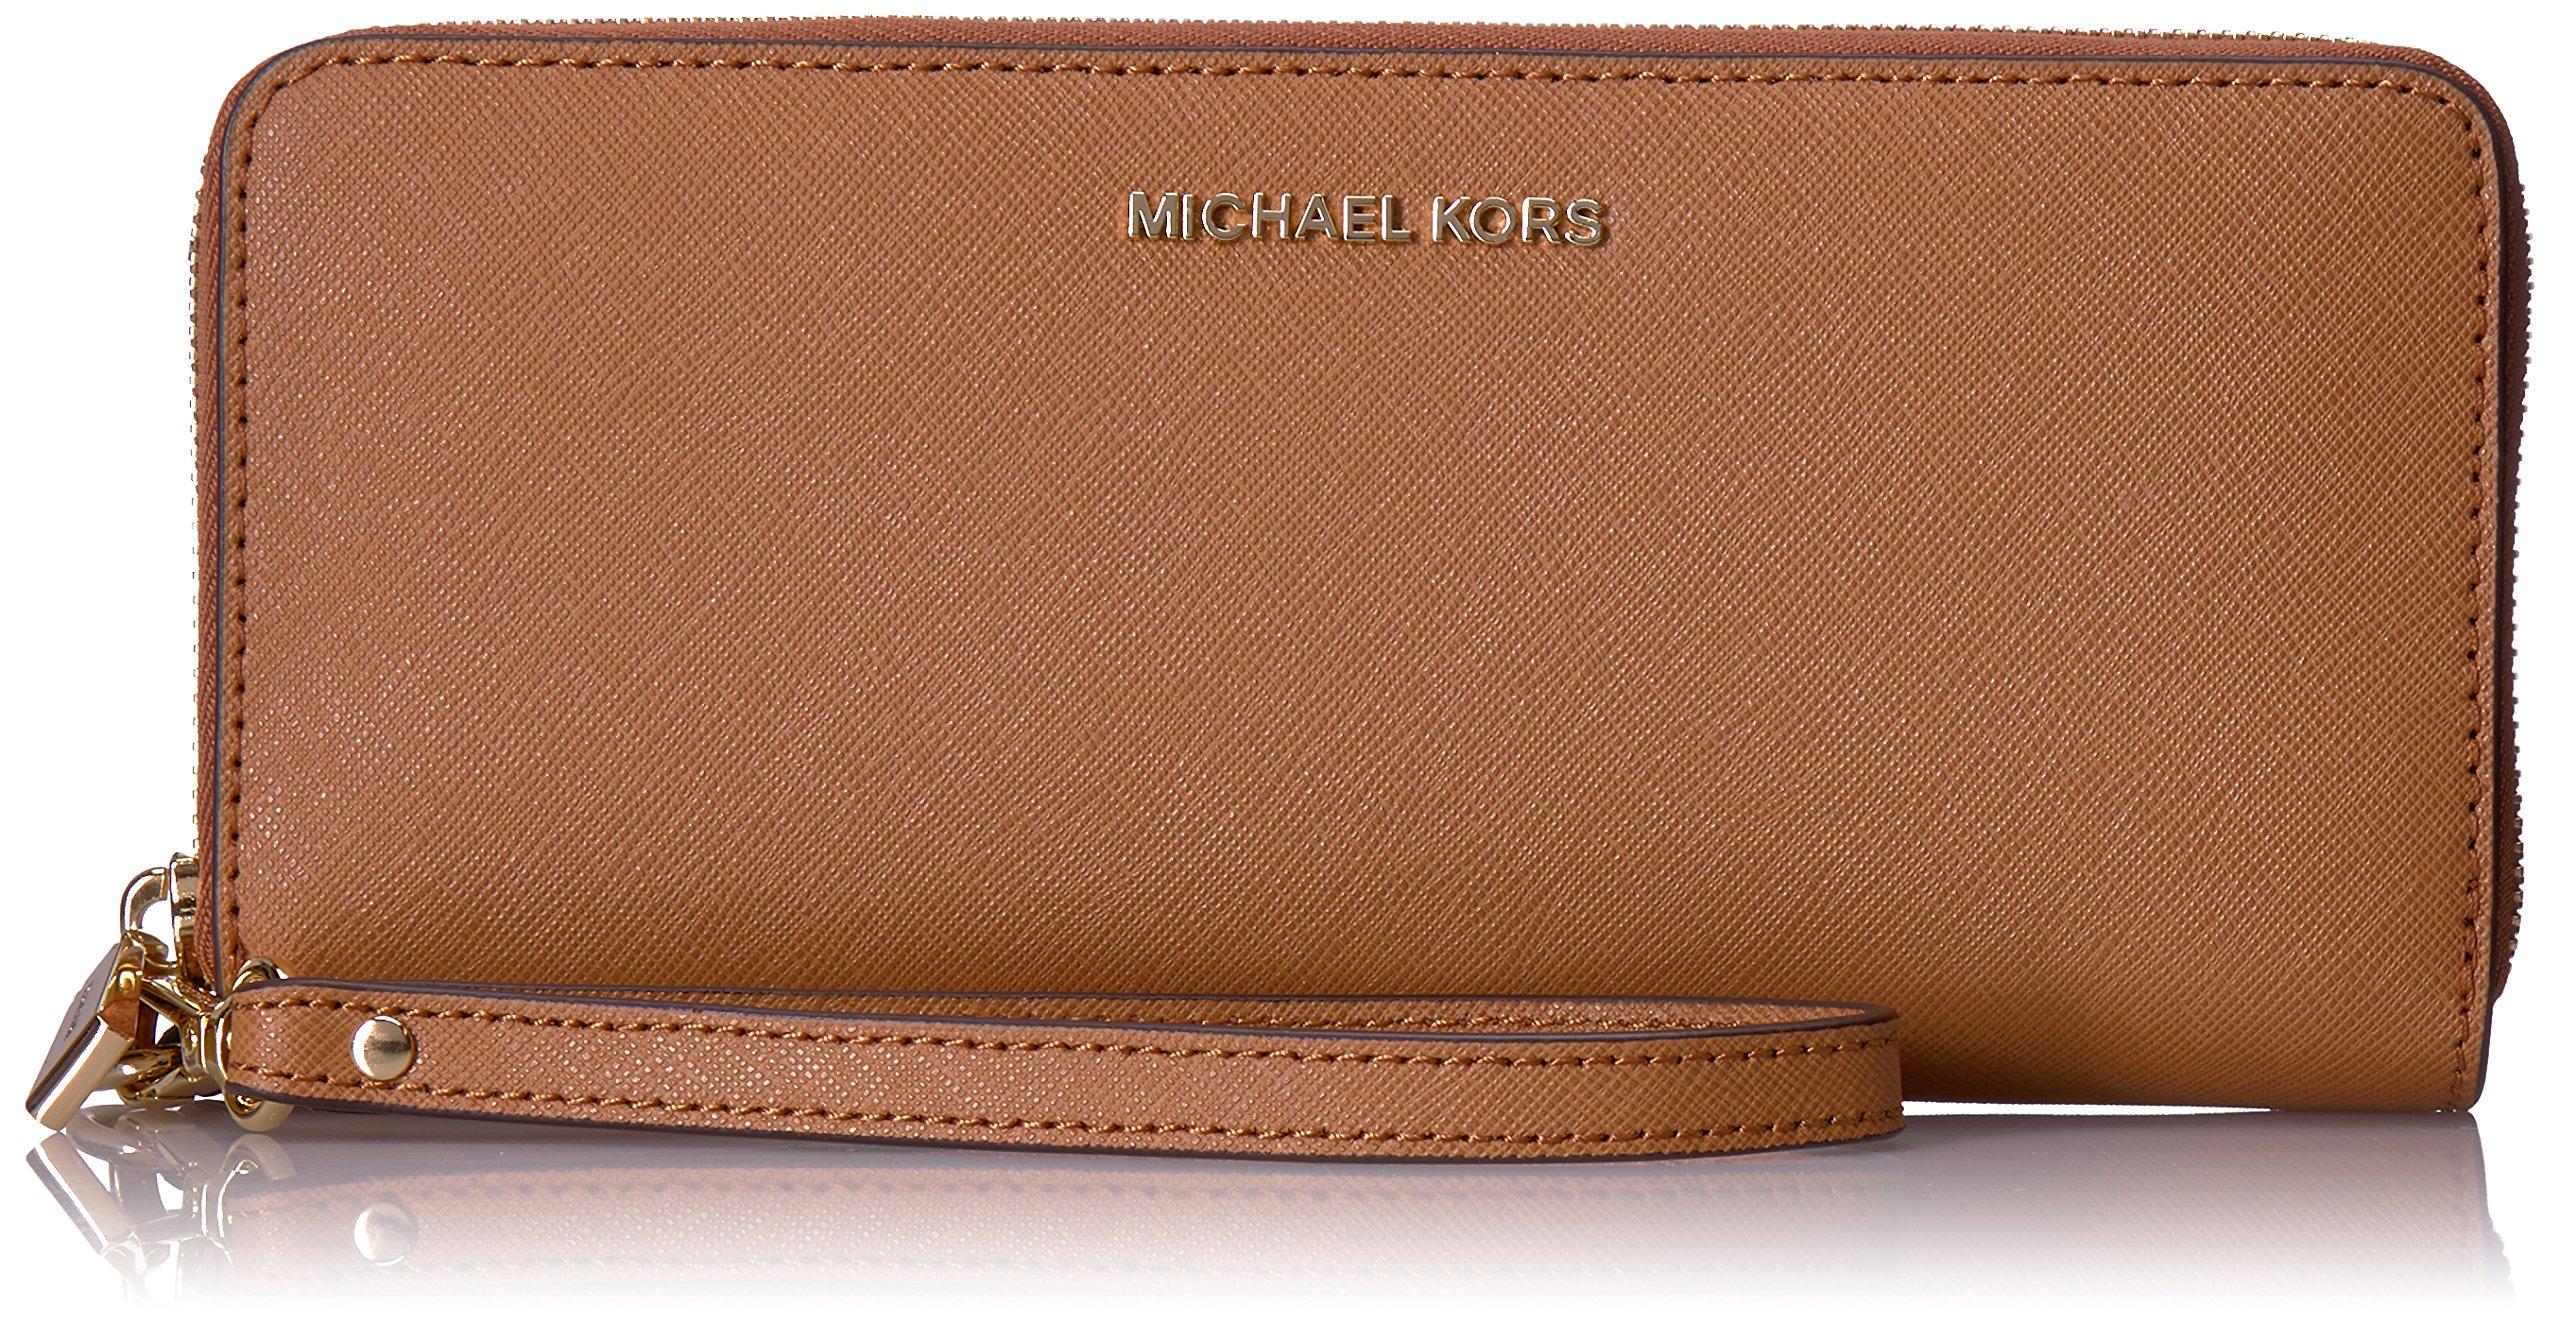 Michael Kors Women's Jet Set Travel Leather Continental Wallet Wristlet - Acorn